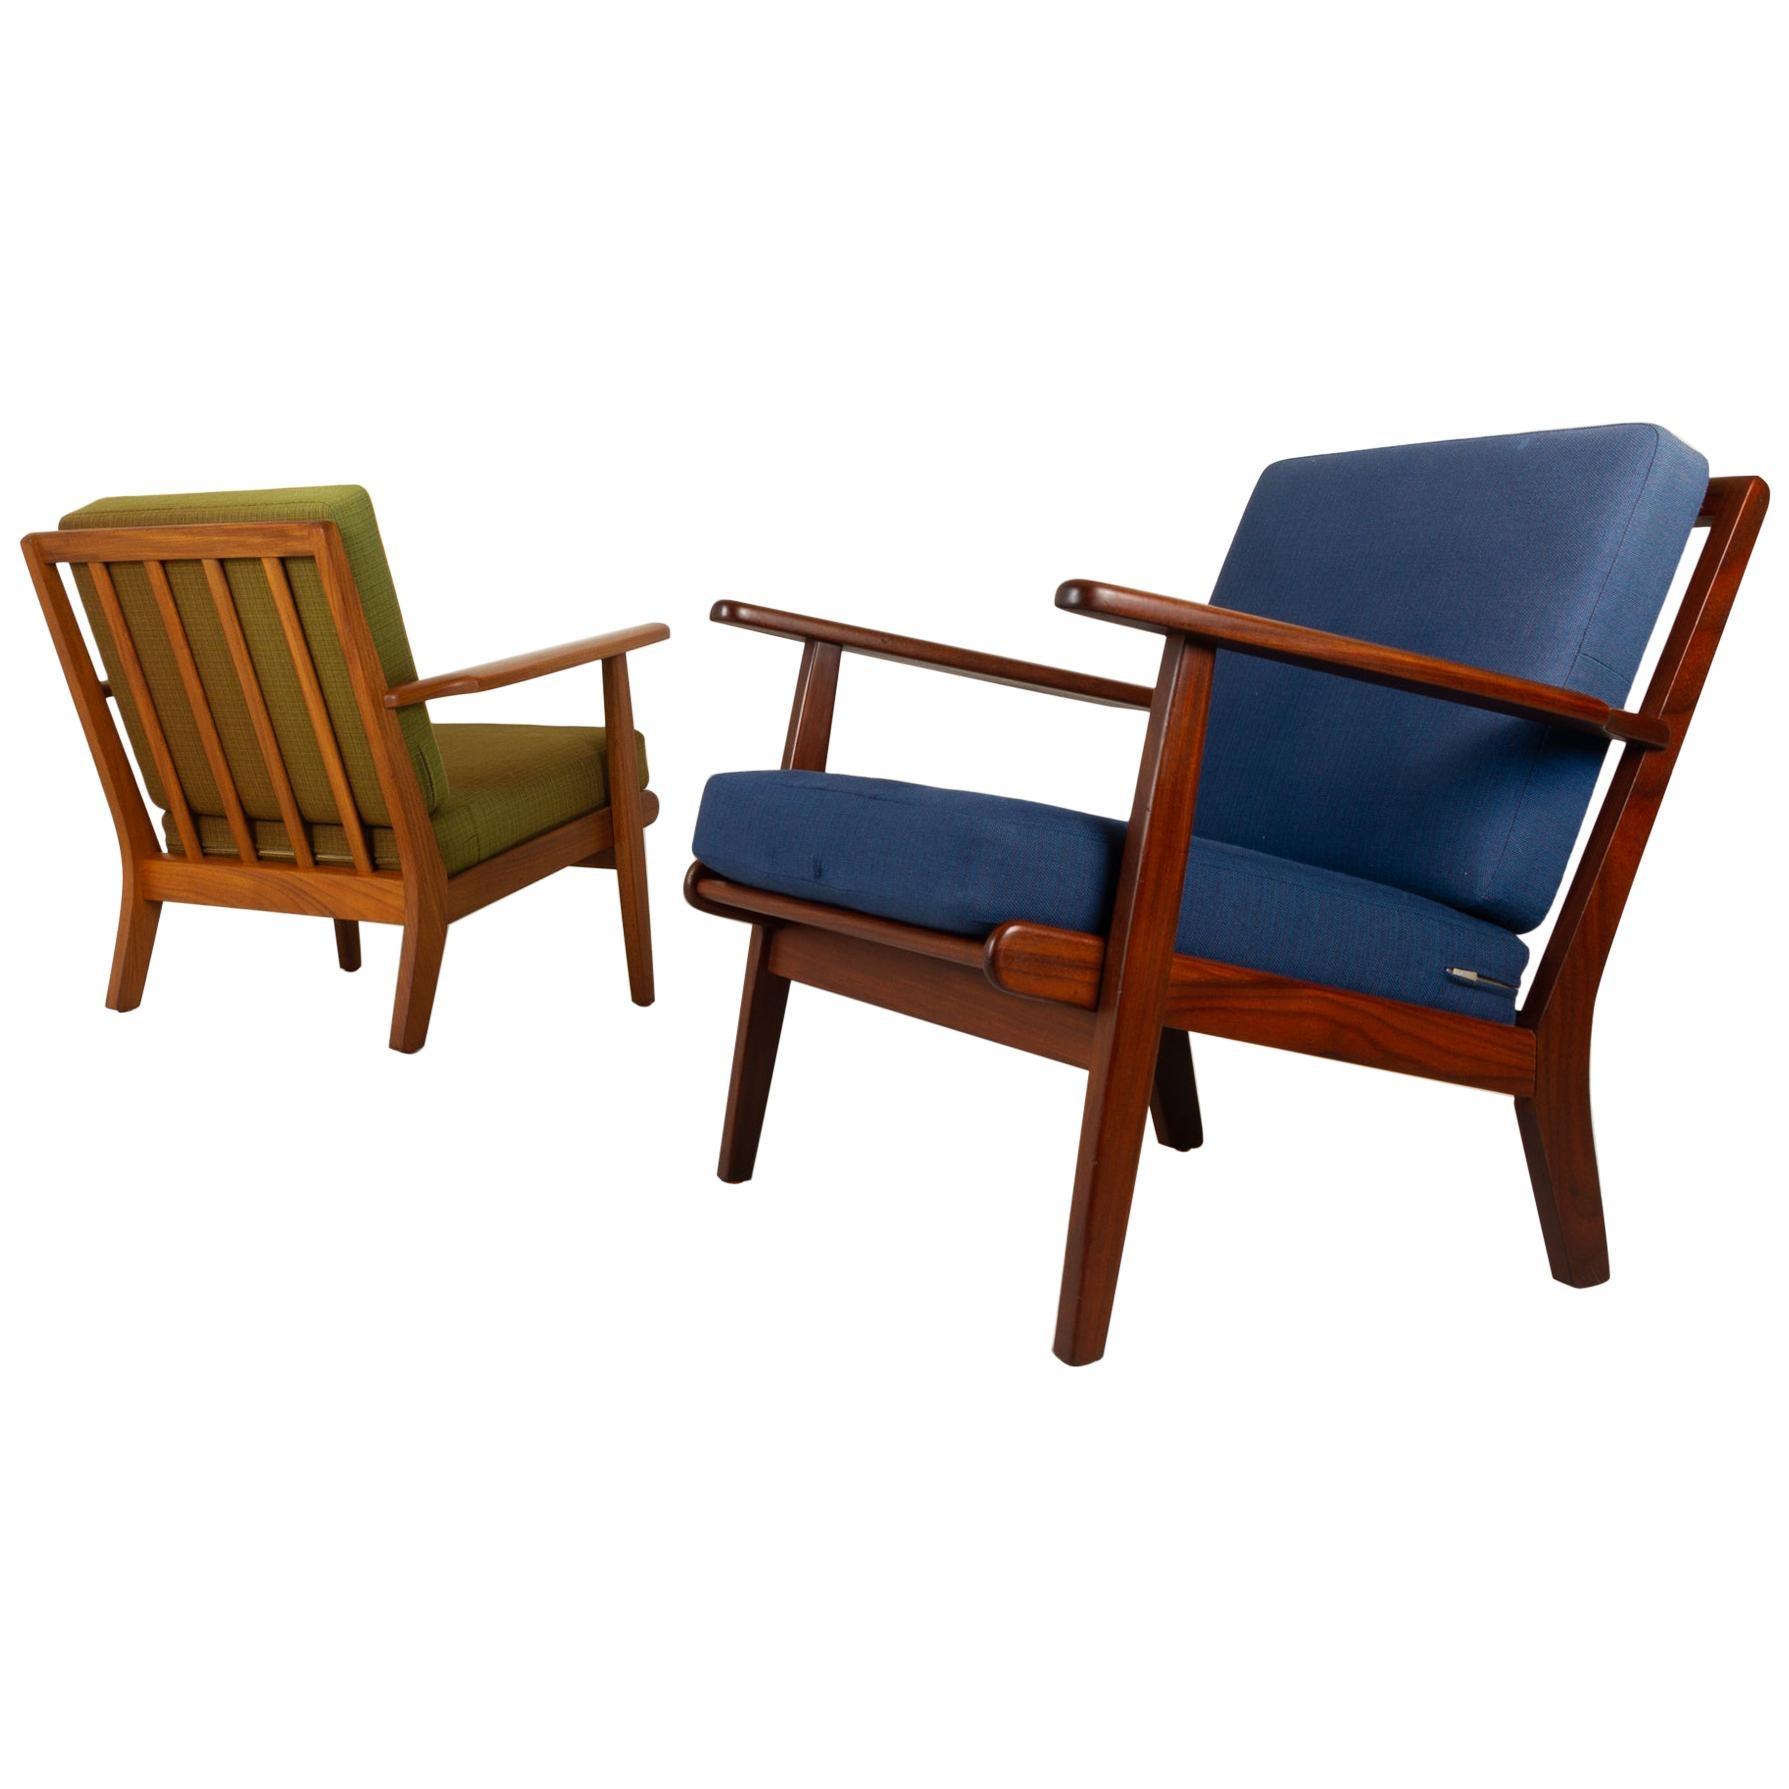 Vintage Danish Lounge Chairs by Aage Pedersen for GETAMA 1960s, Set of 2